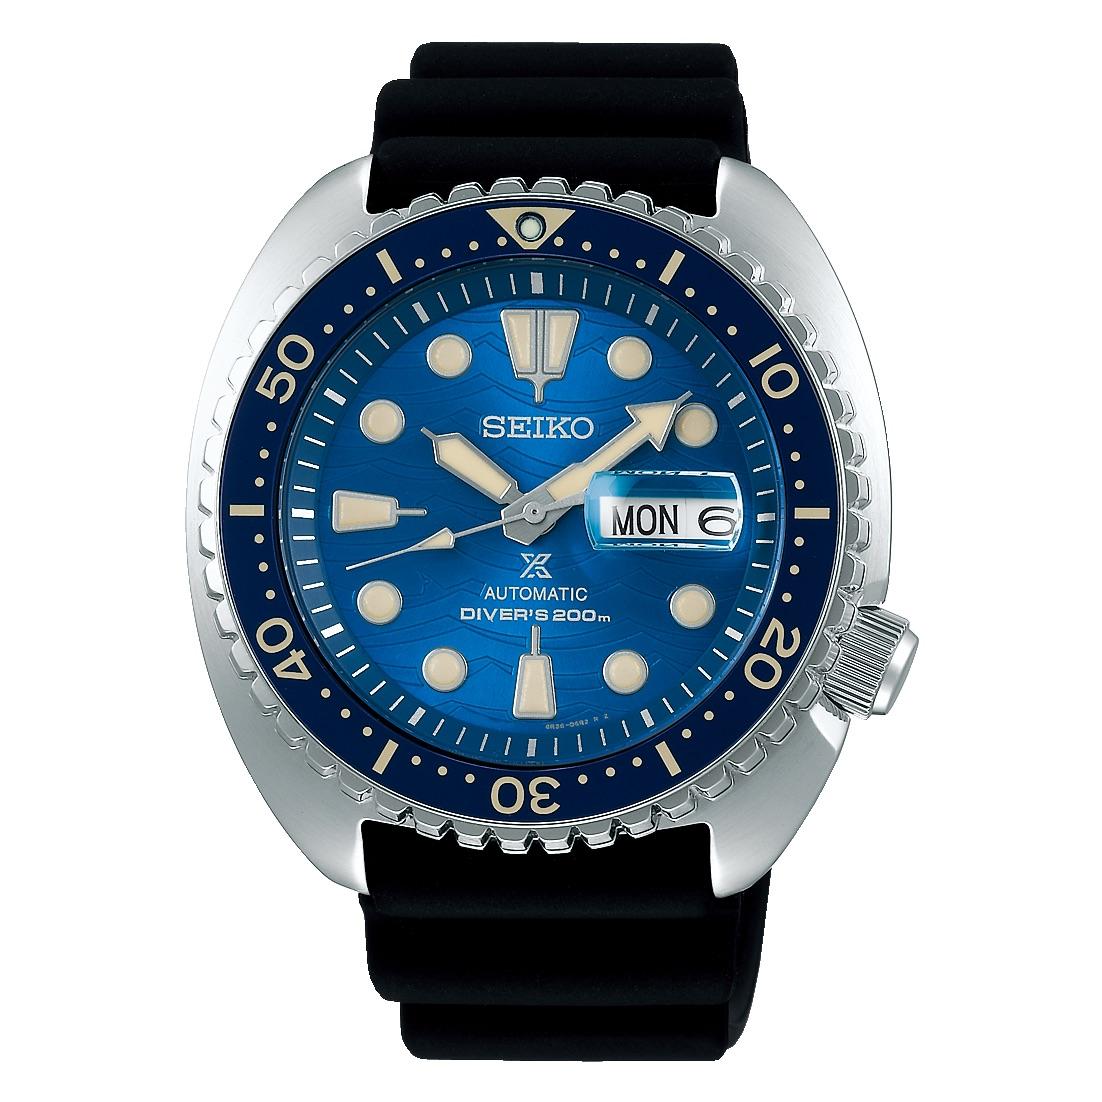 Seiko Prospex Automatic Diver 200m - Seiko King Turtle SRPE07 SRPE07K1